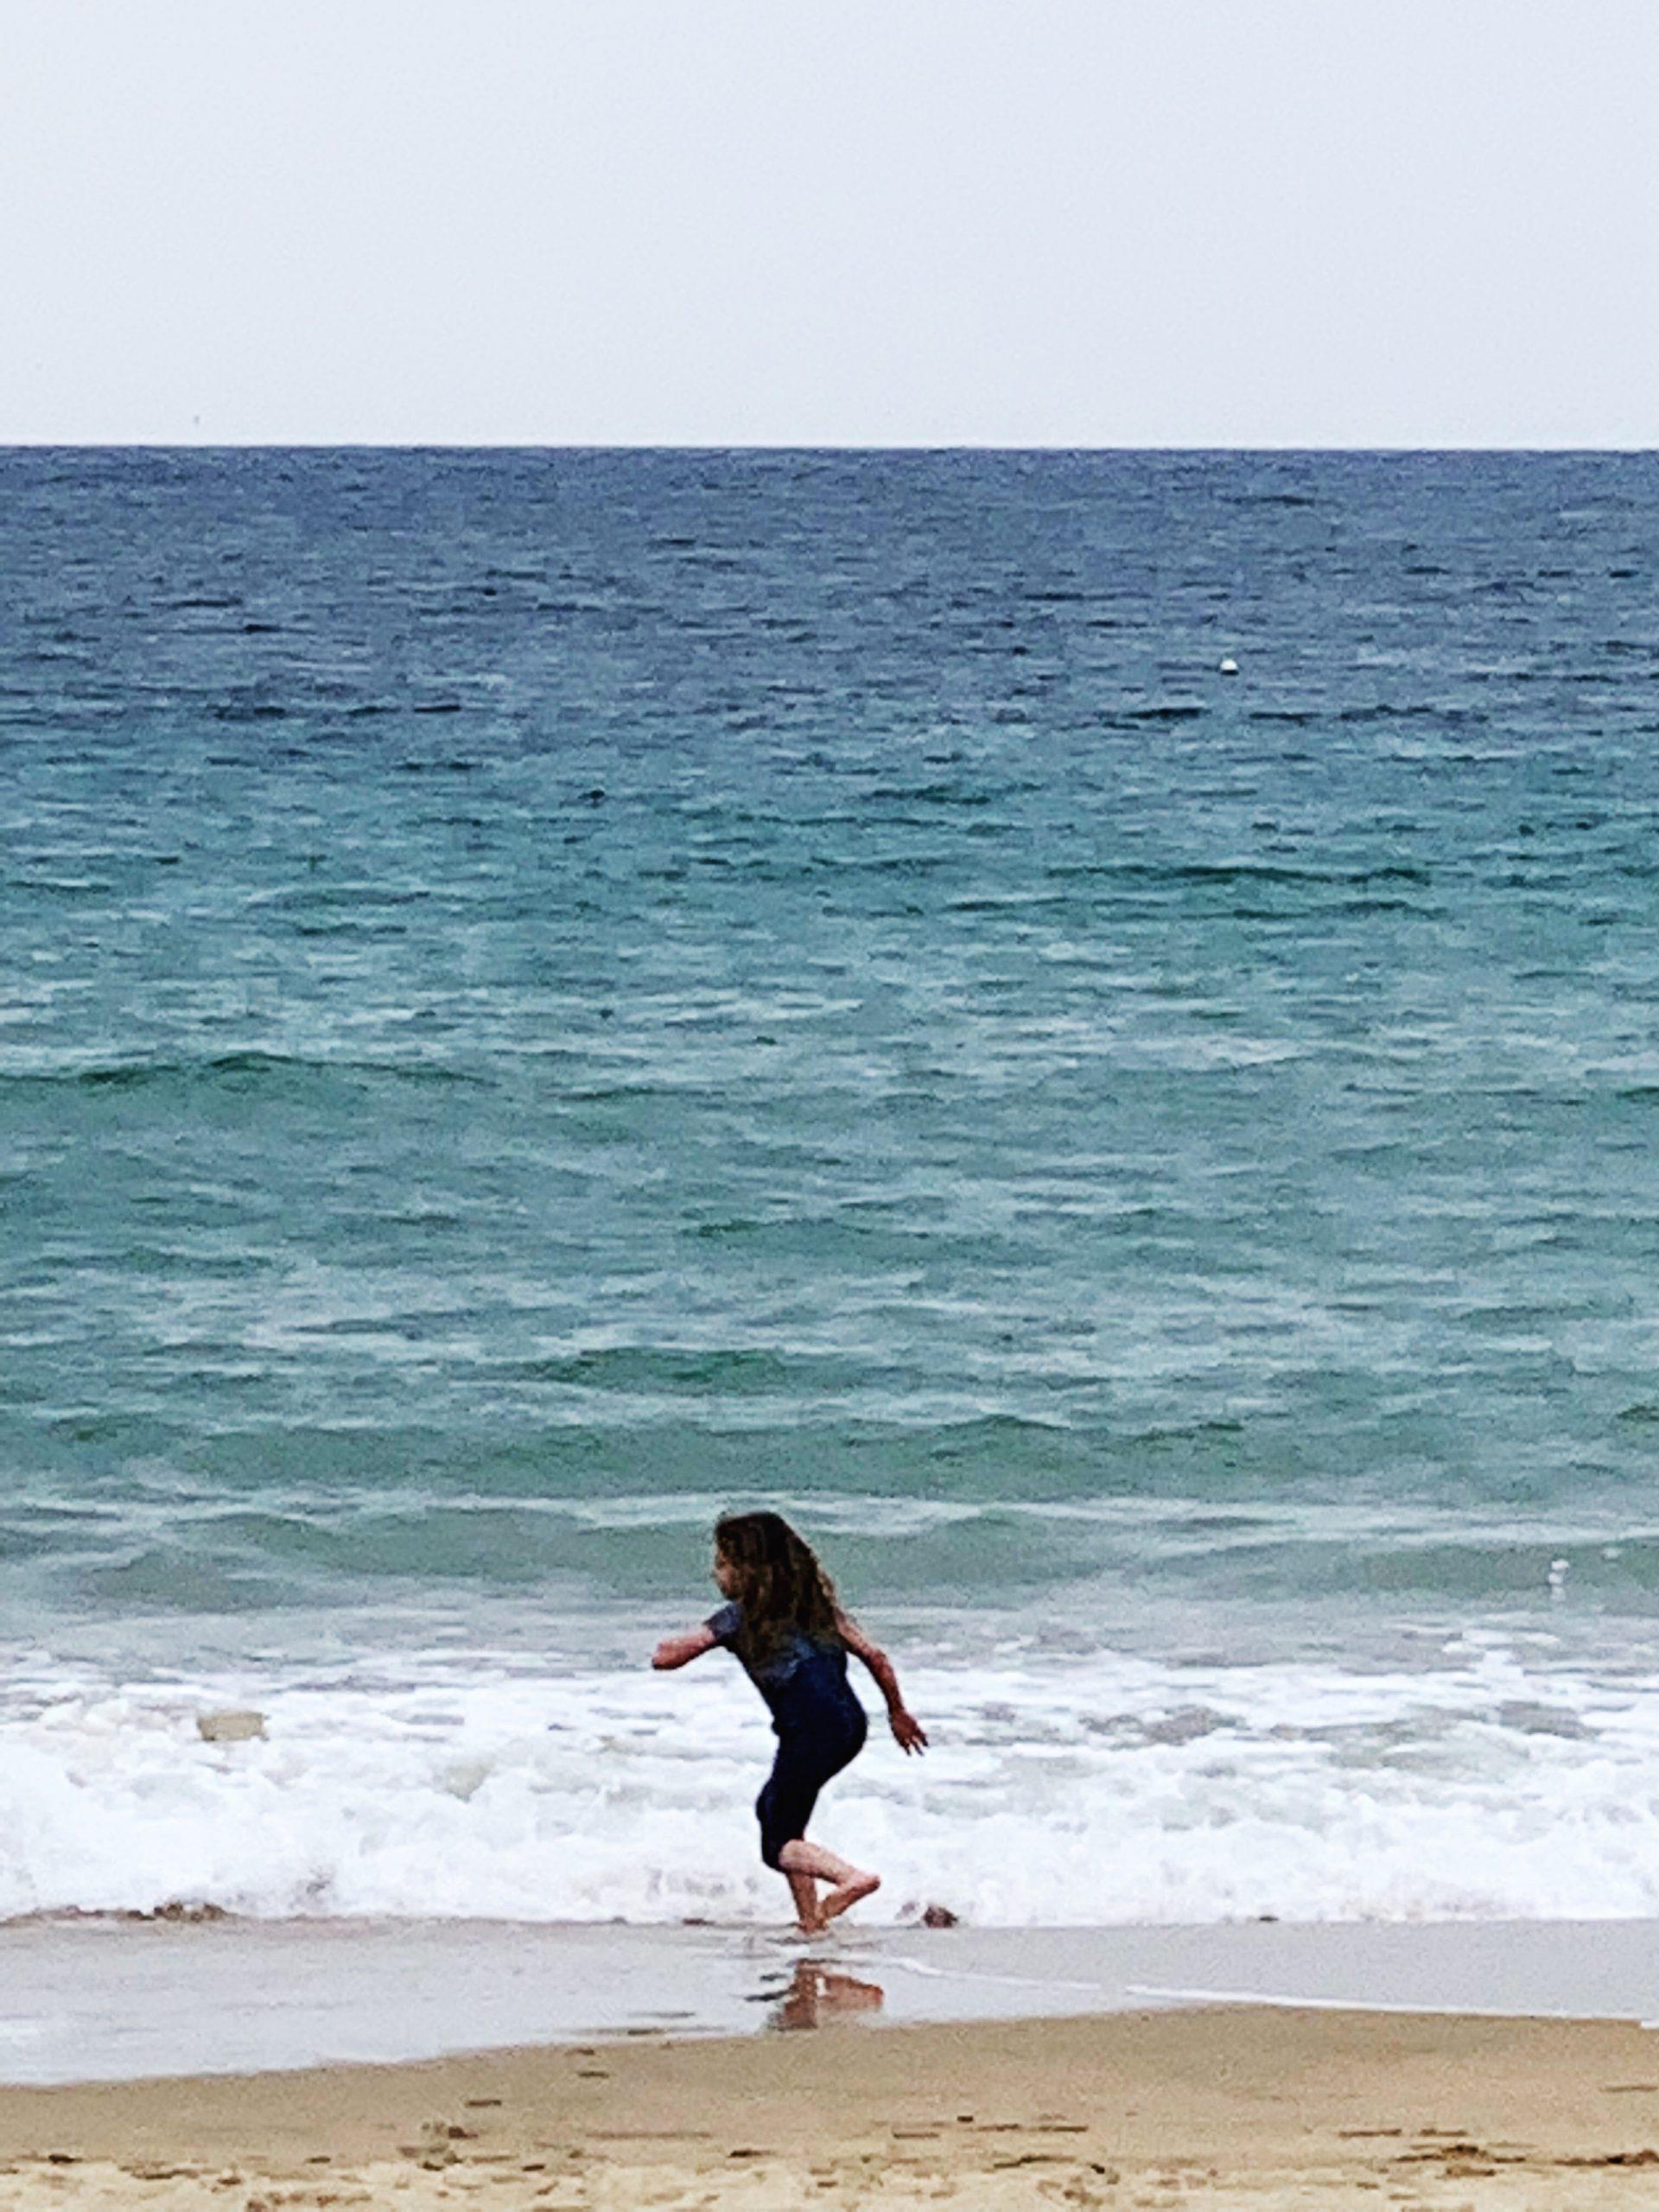 piper quinn having fun on the beach in the basque country